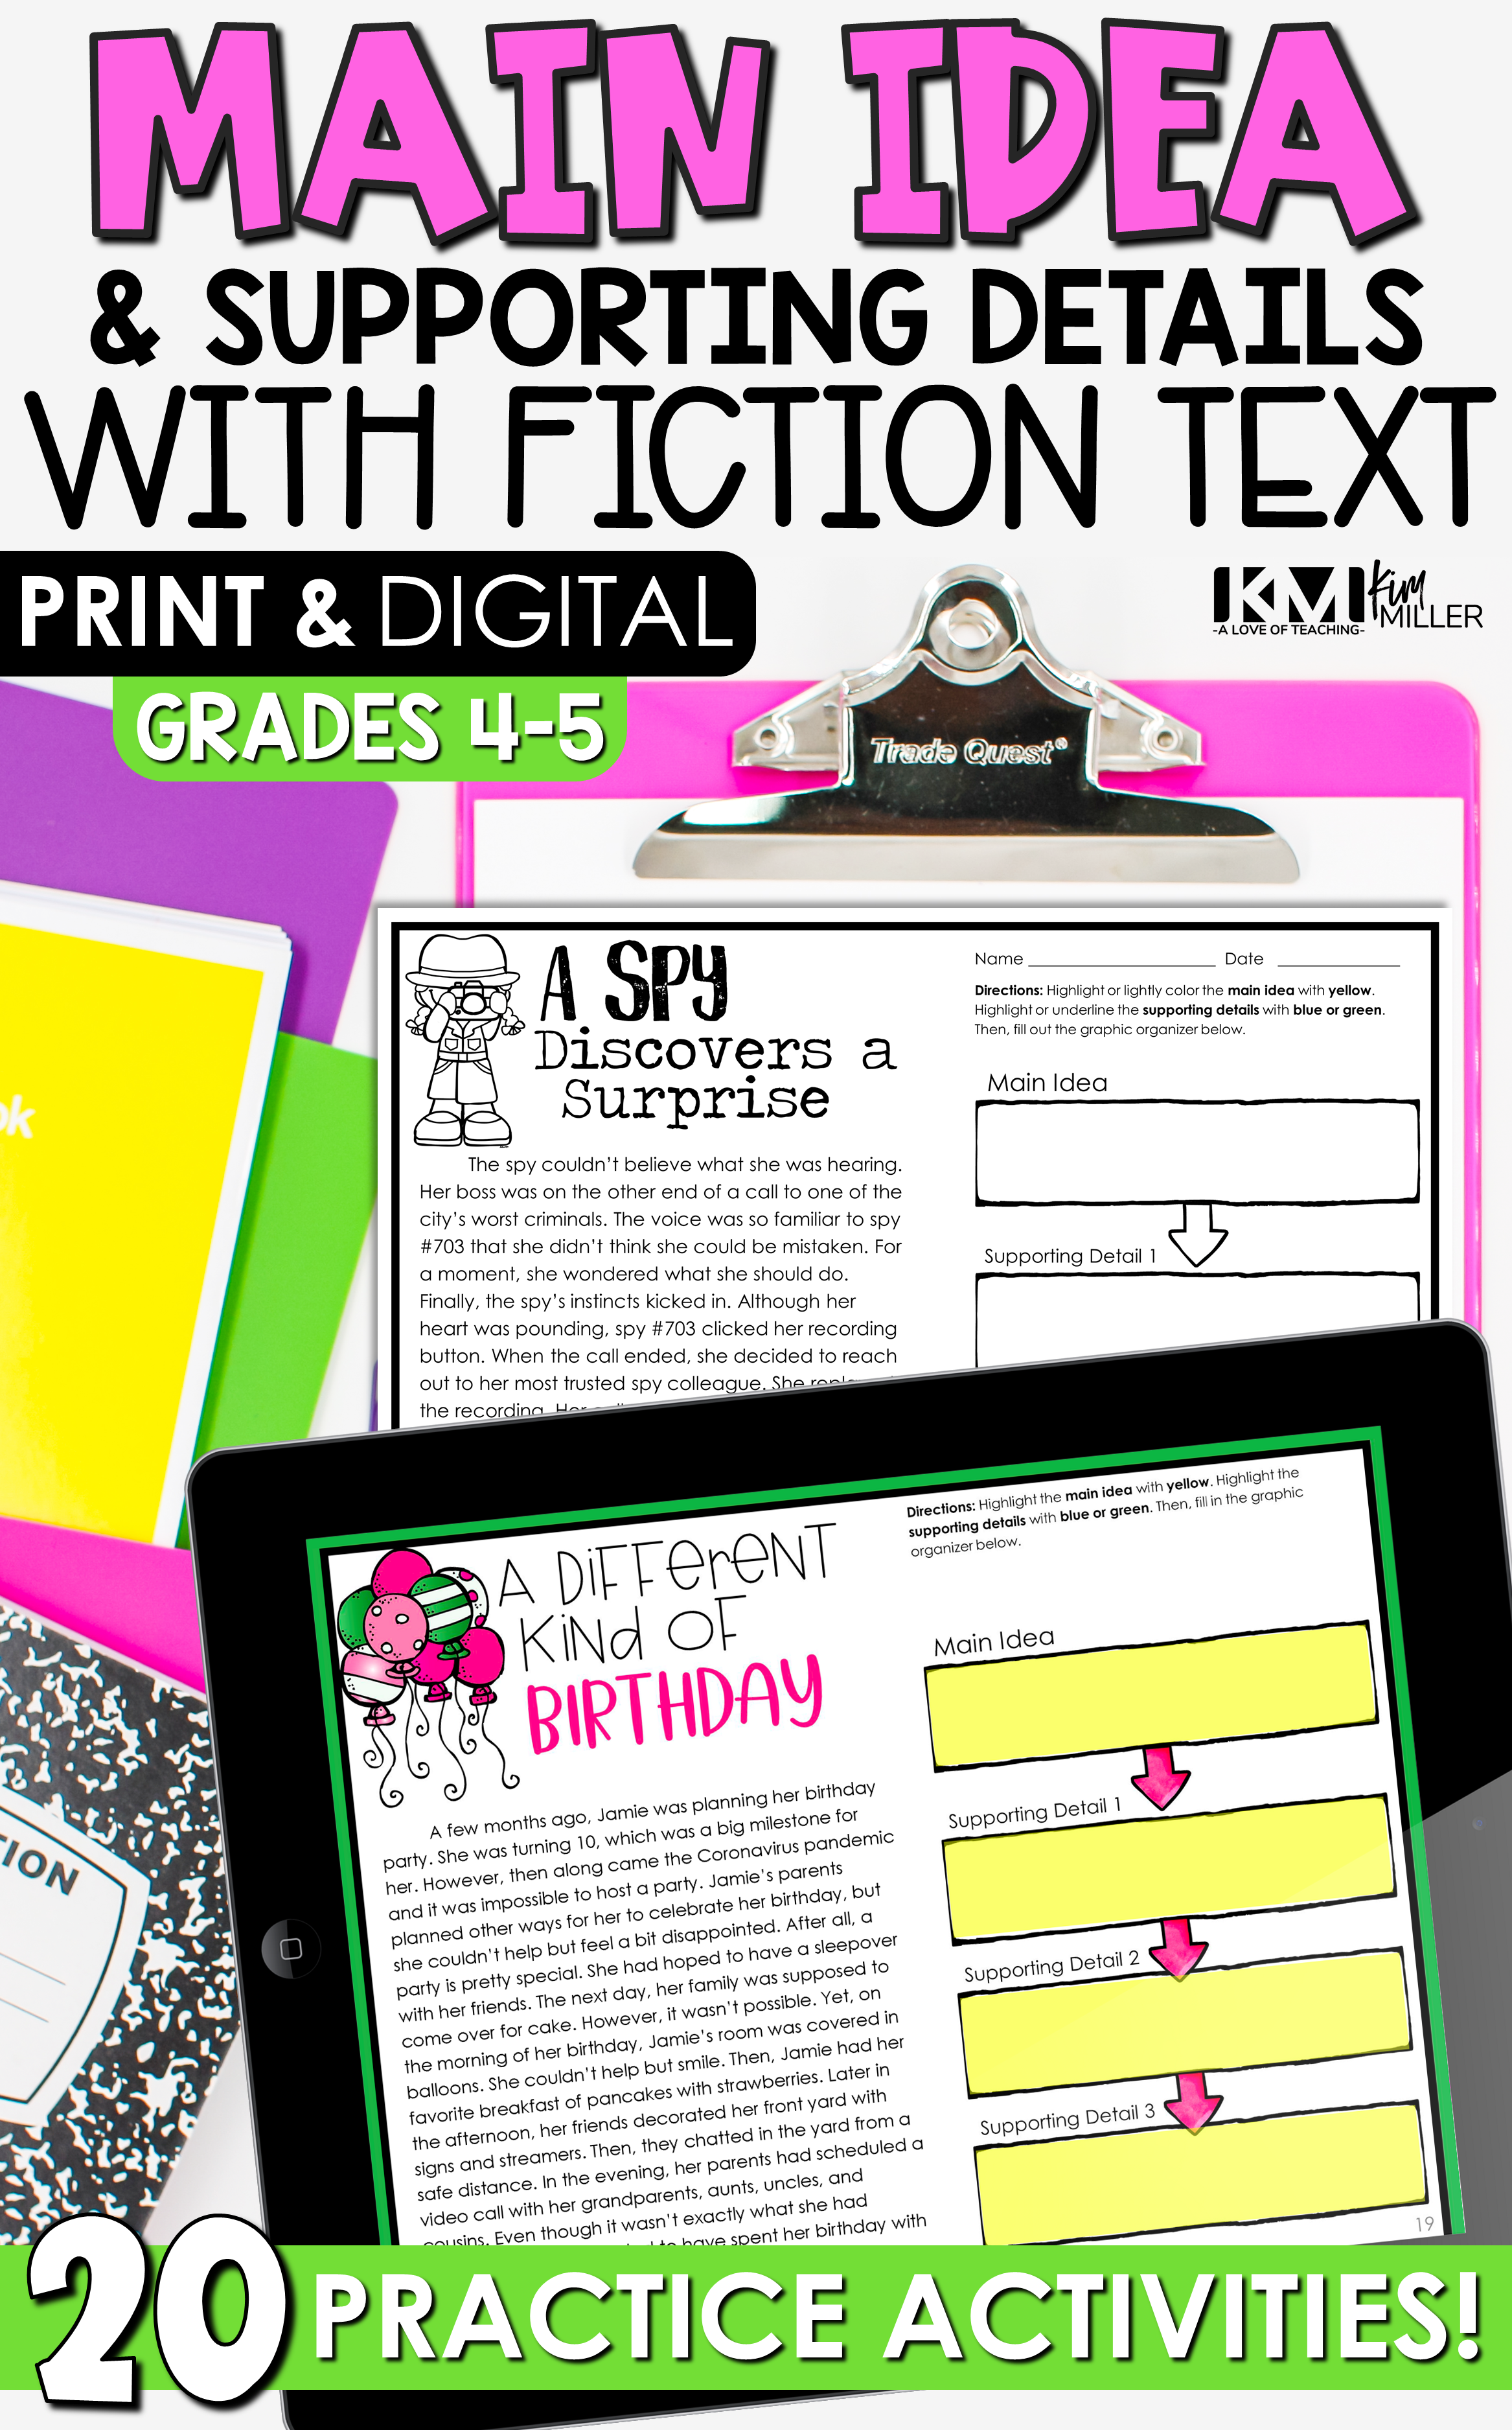 medium resolution of Main Idea Activities and Worksheets for Print or Google Classroom    Teachers pay teachers freebies